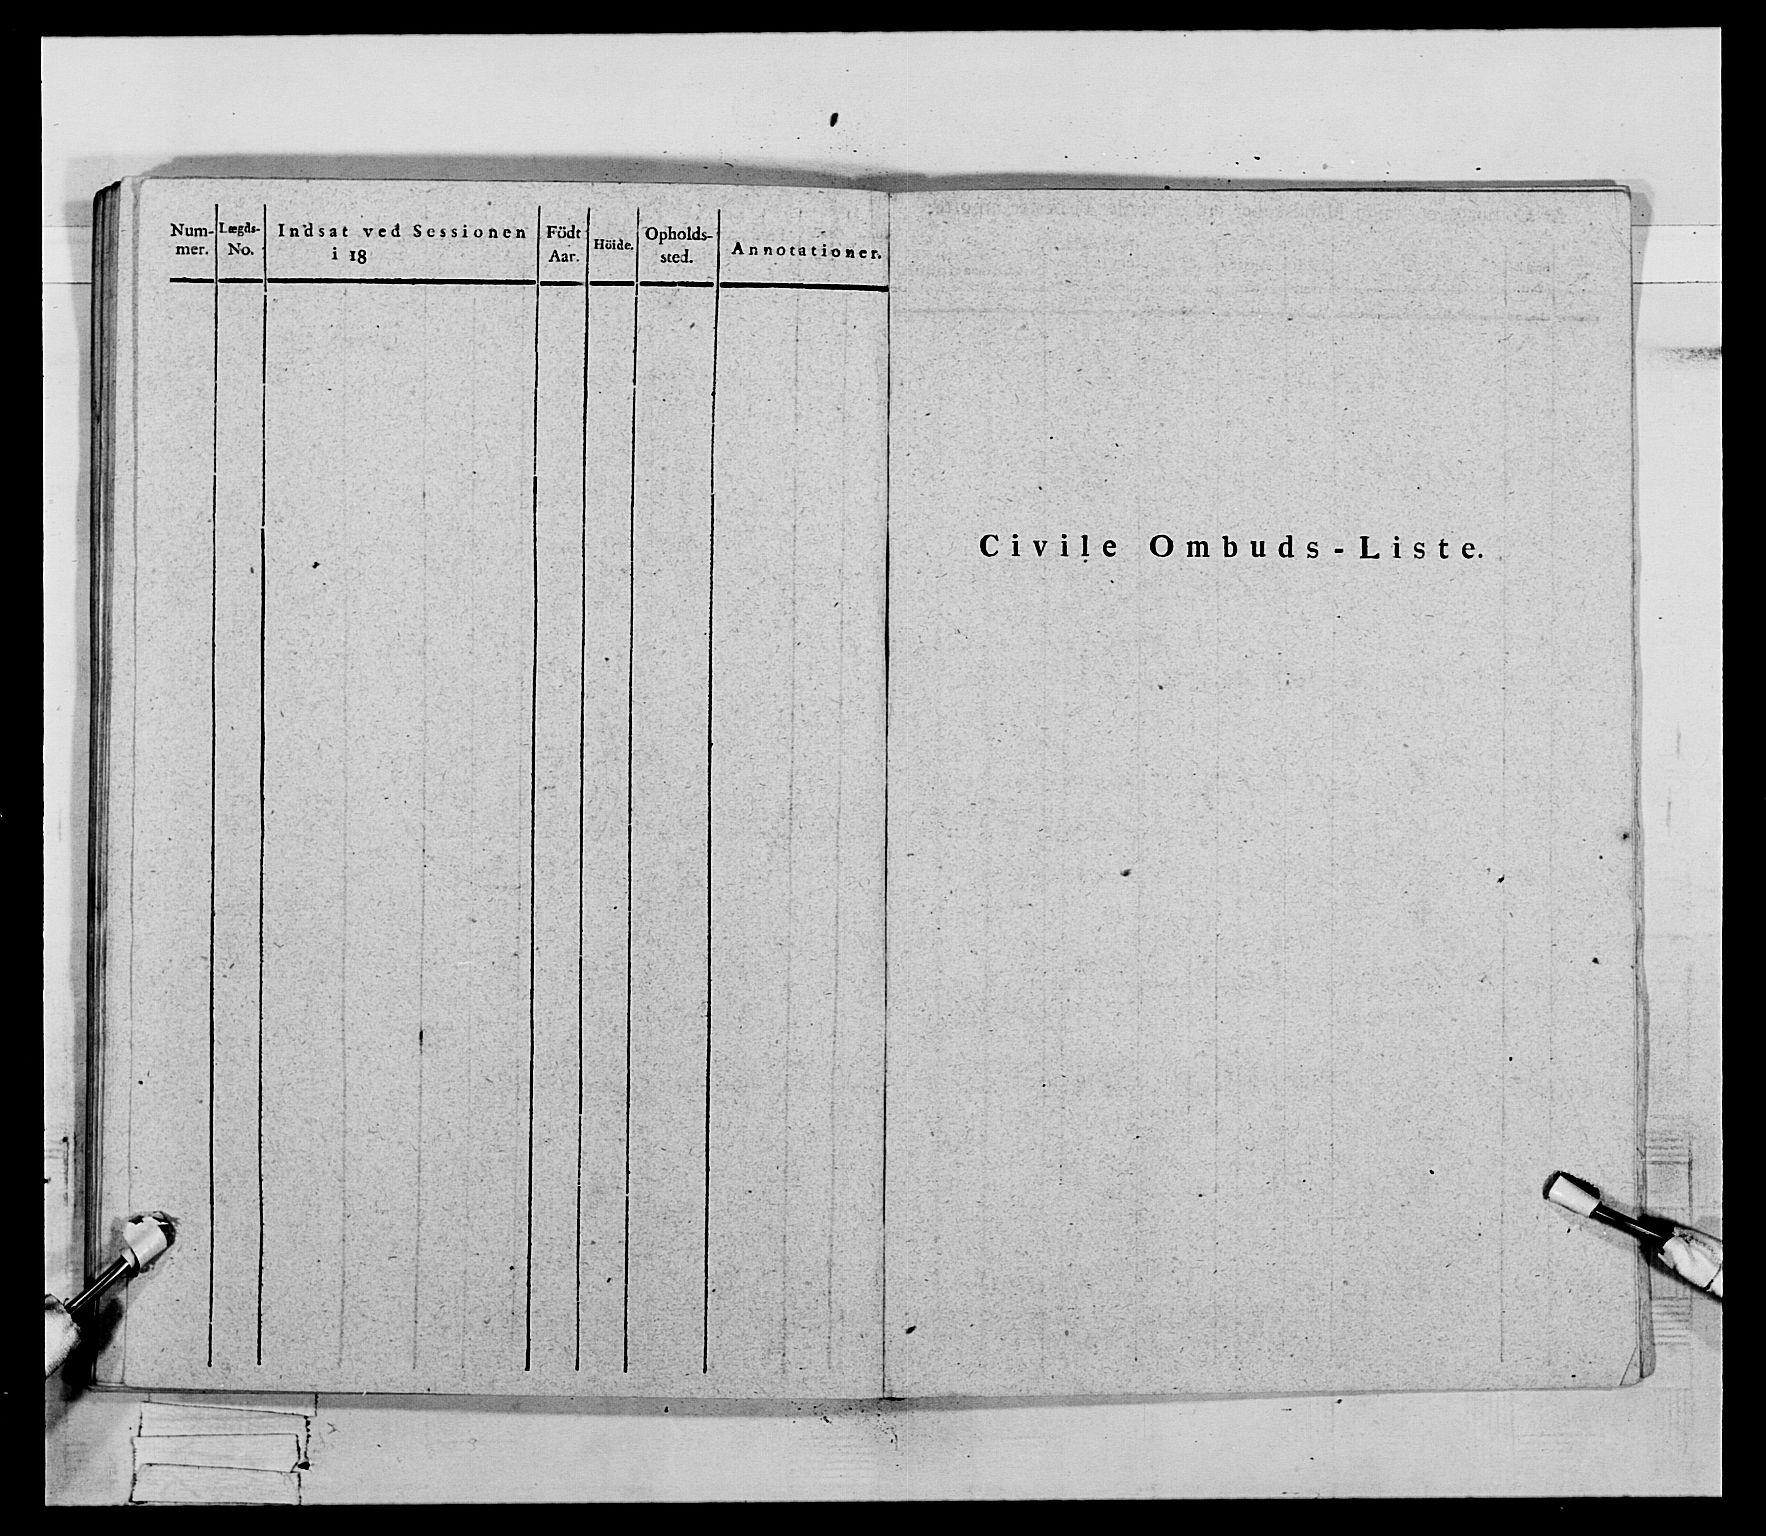 RA, Generalitets- og kommissariatskollegiet, Det kongelige norske kommissariatskollegium, E/Eh/L0069: Opplandske gevorbne infanteriregiment, 1810-1818, s. 512